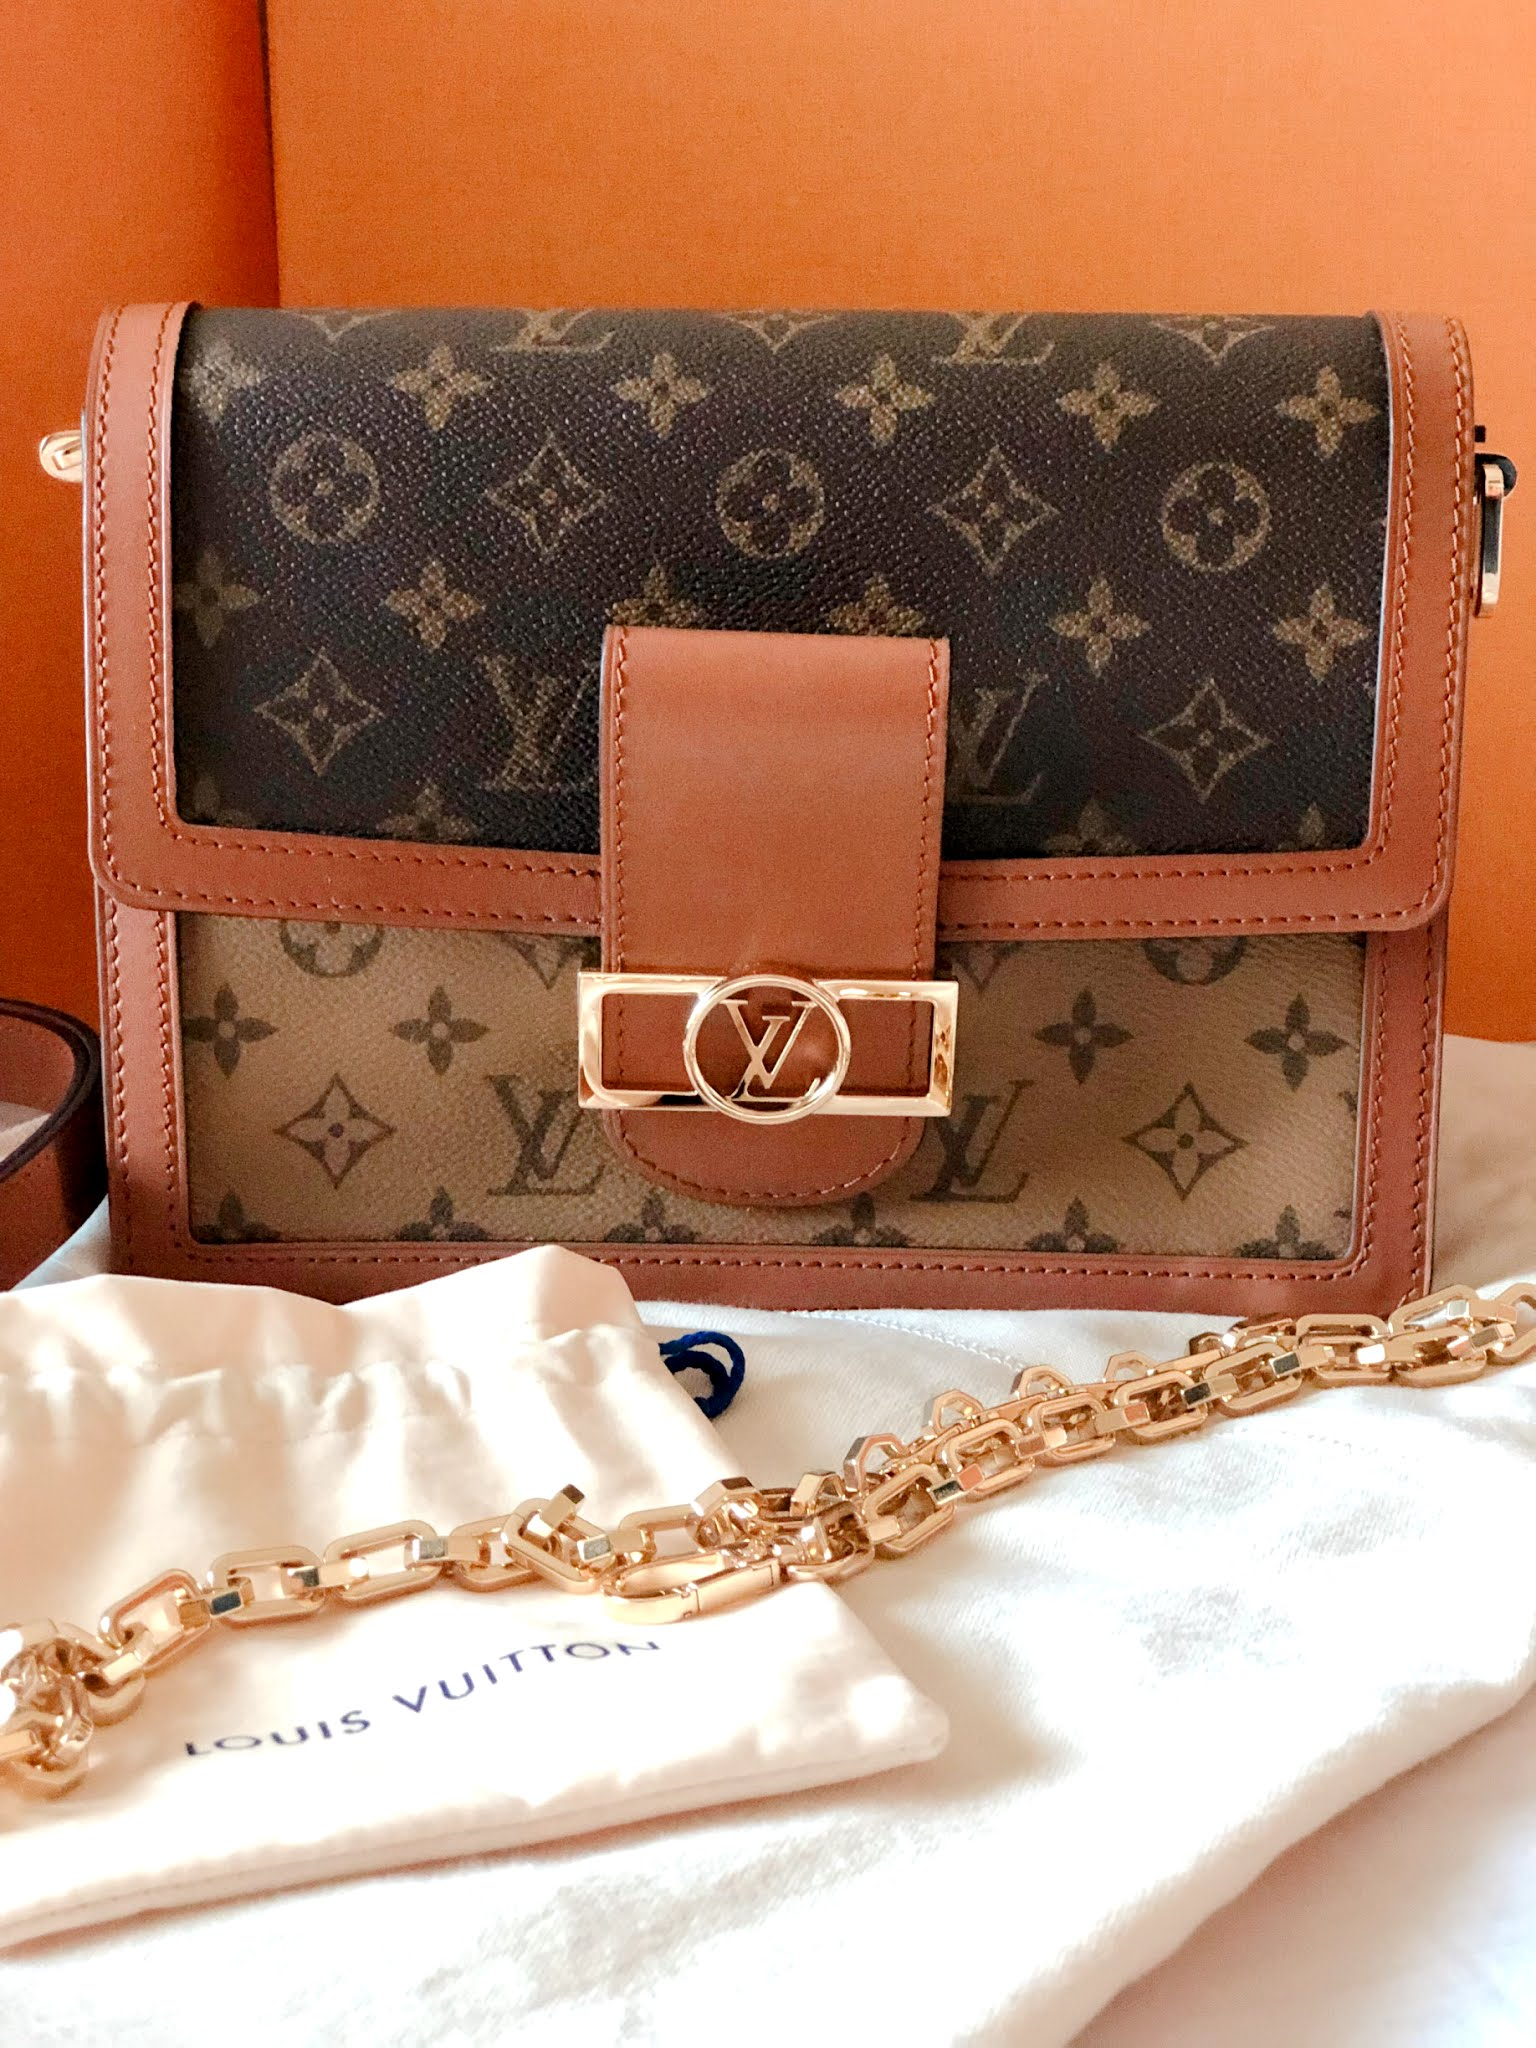 Louis Vuitton Dauphine MM handbag unboxing